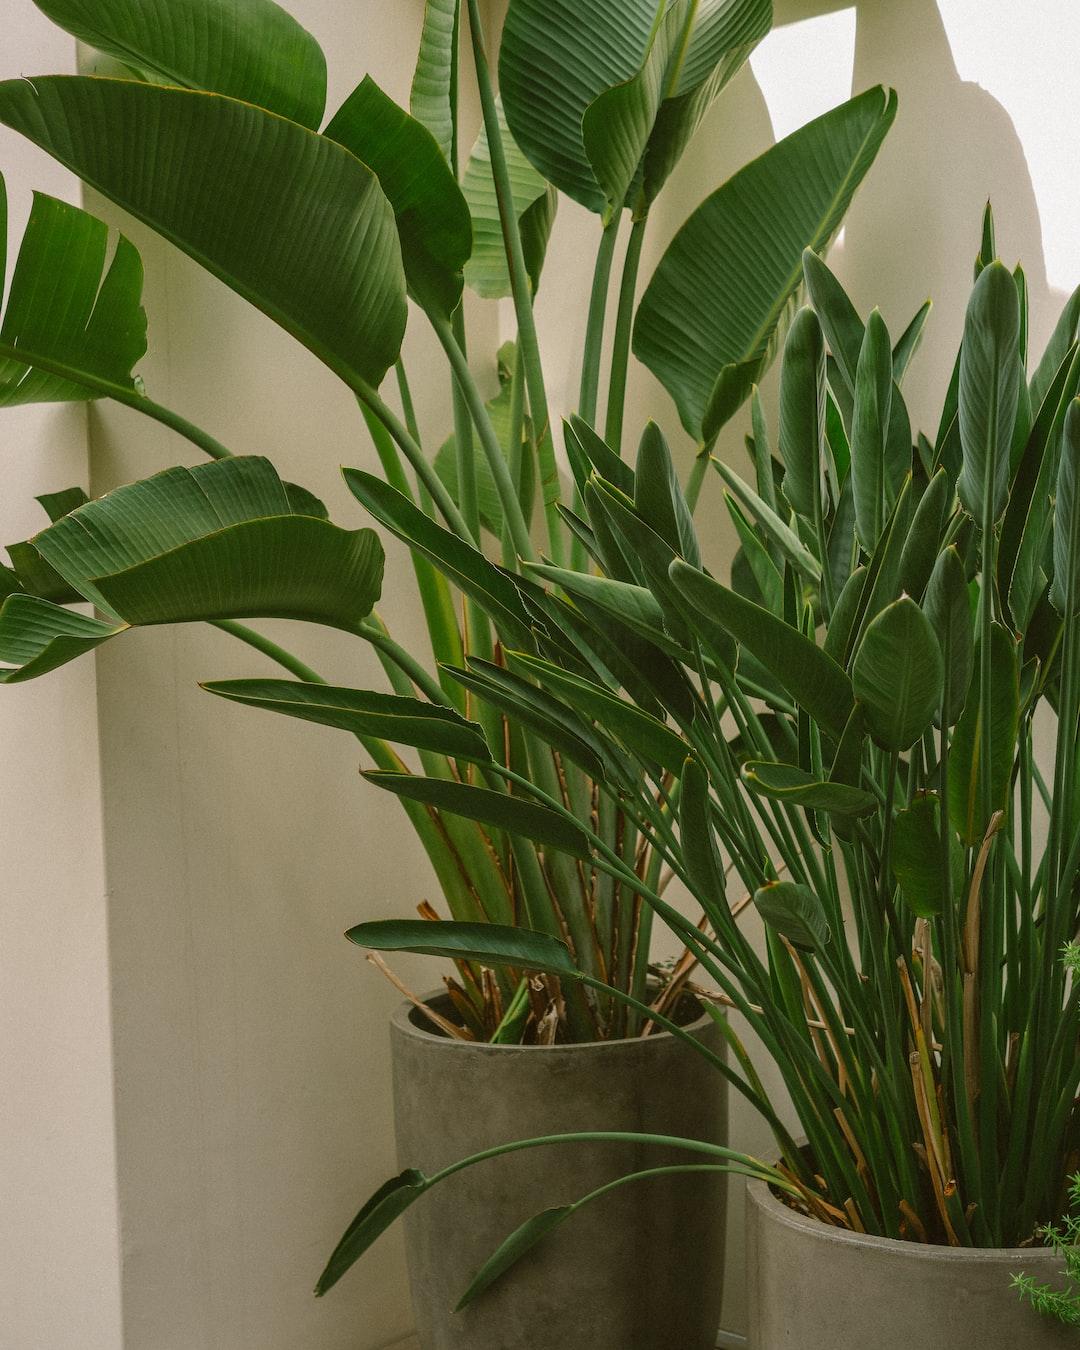 Strelitzia reginae, commonly known as the crane flower or bird of paradise.